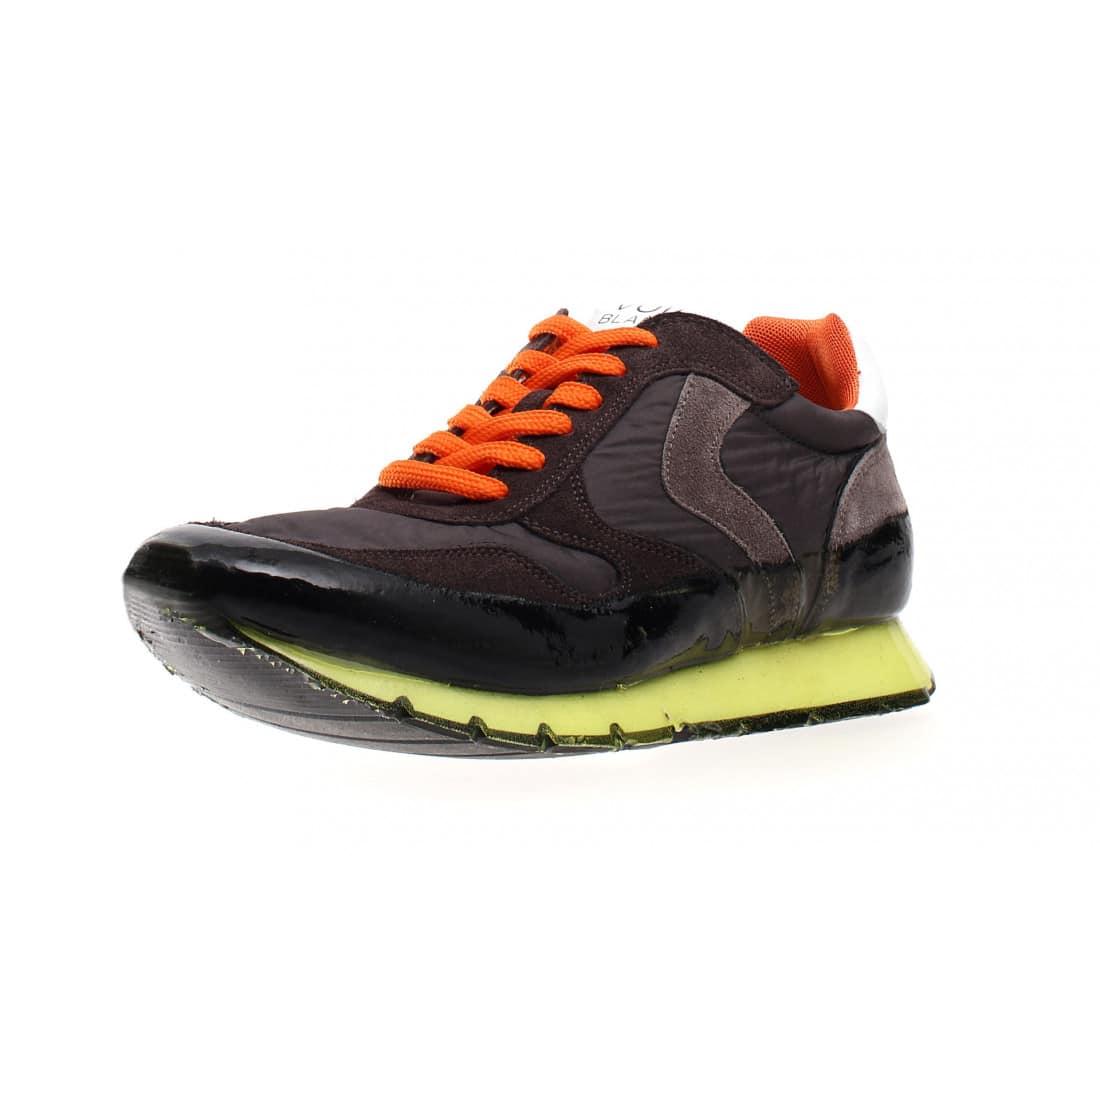 Voile Blanche LIAM SPLASH - Men Sneakers uomo - Grey c00f80c378d